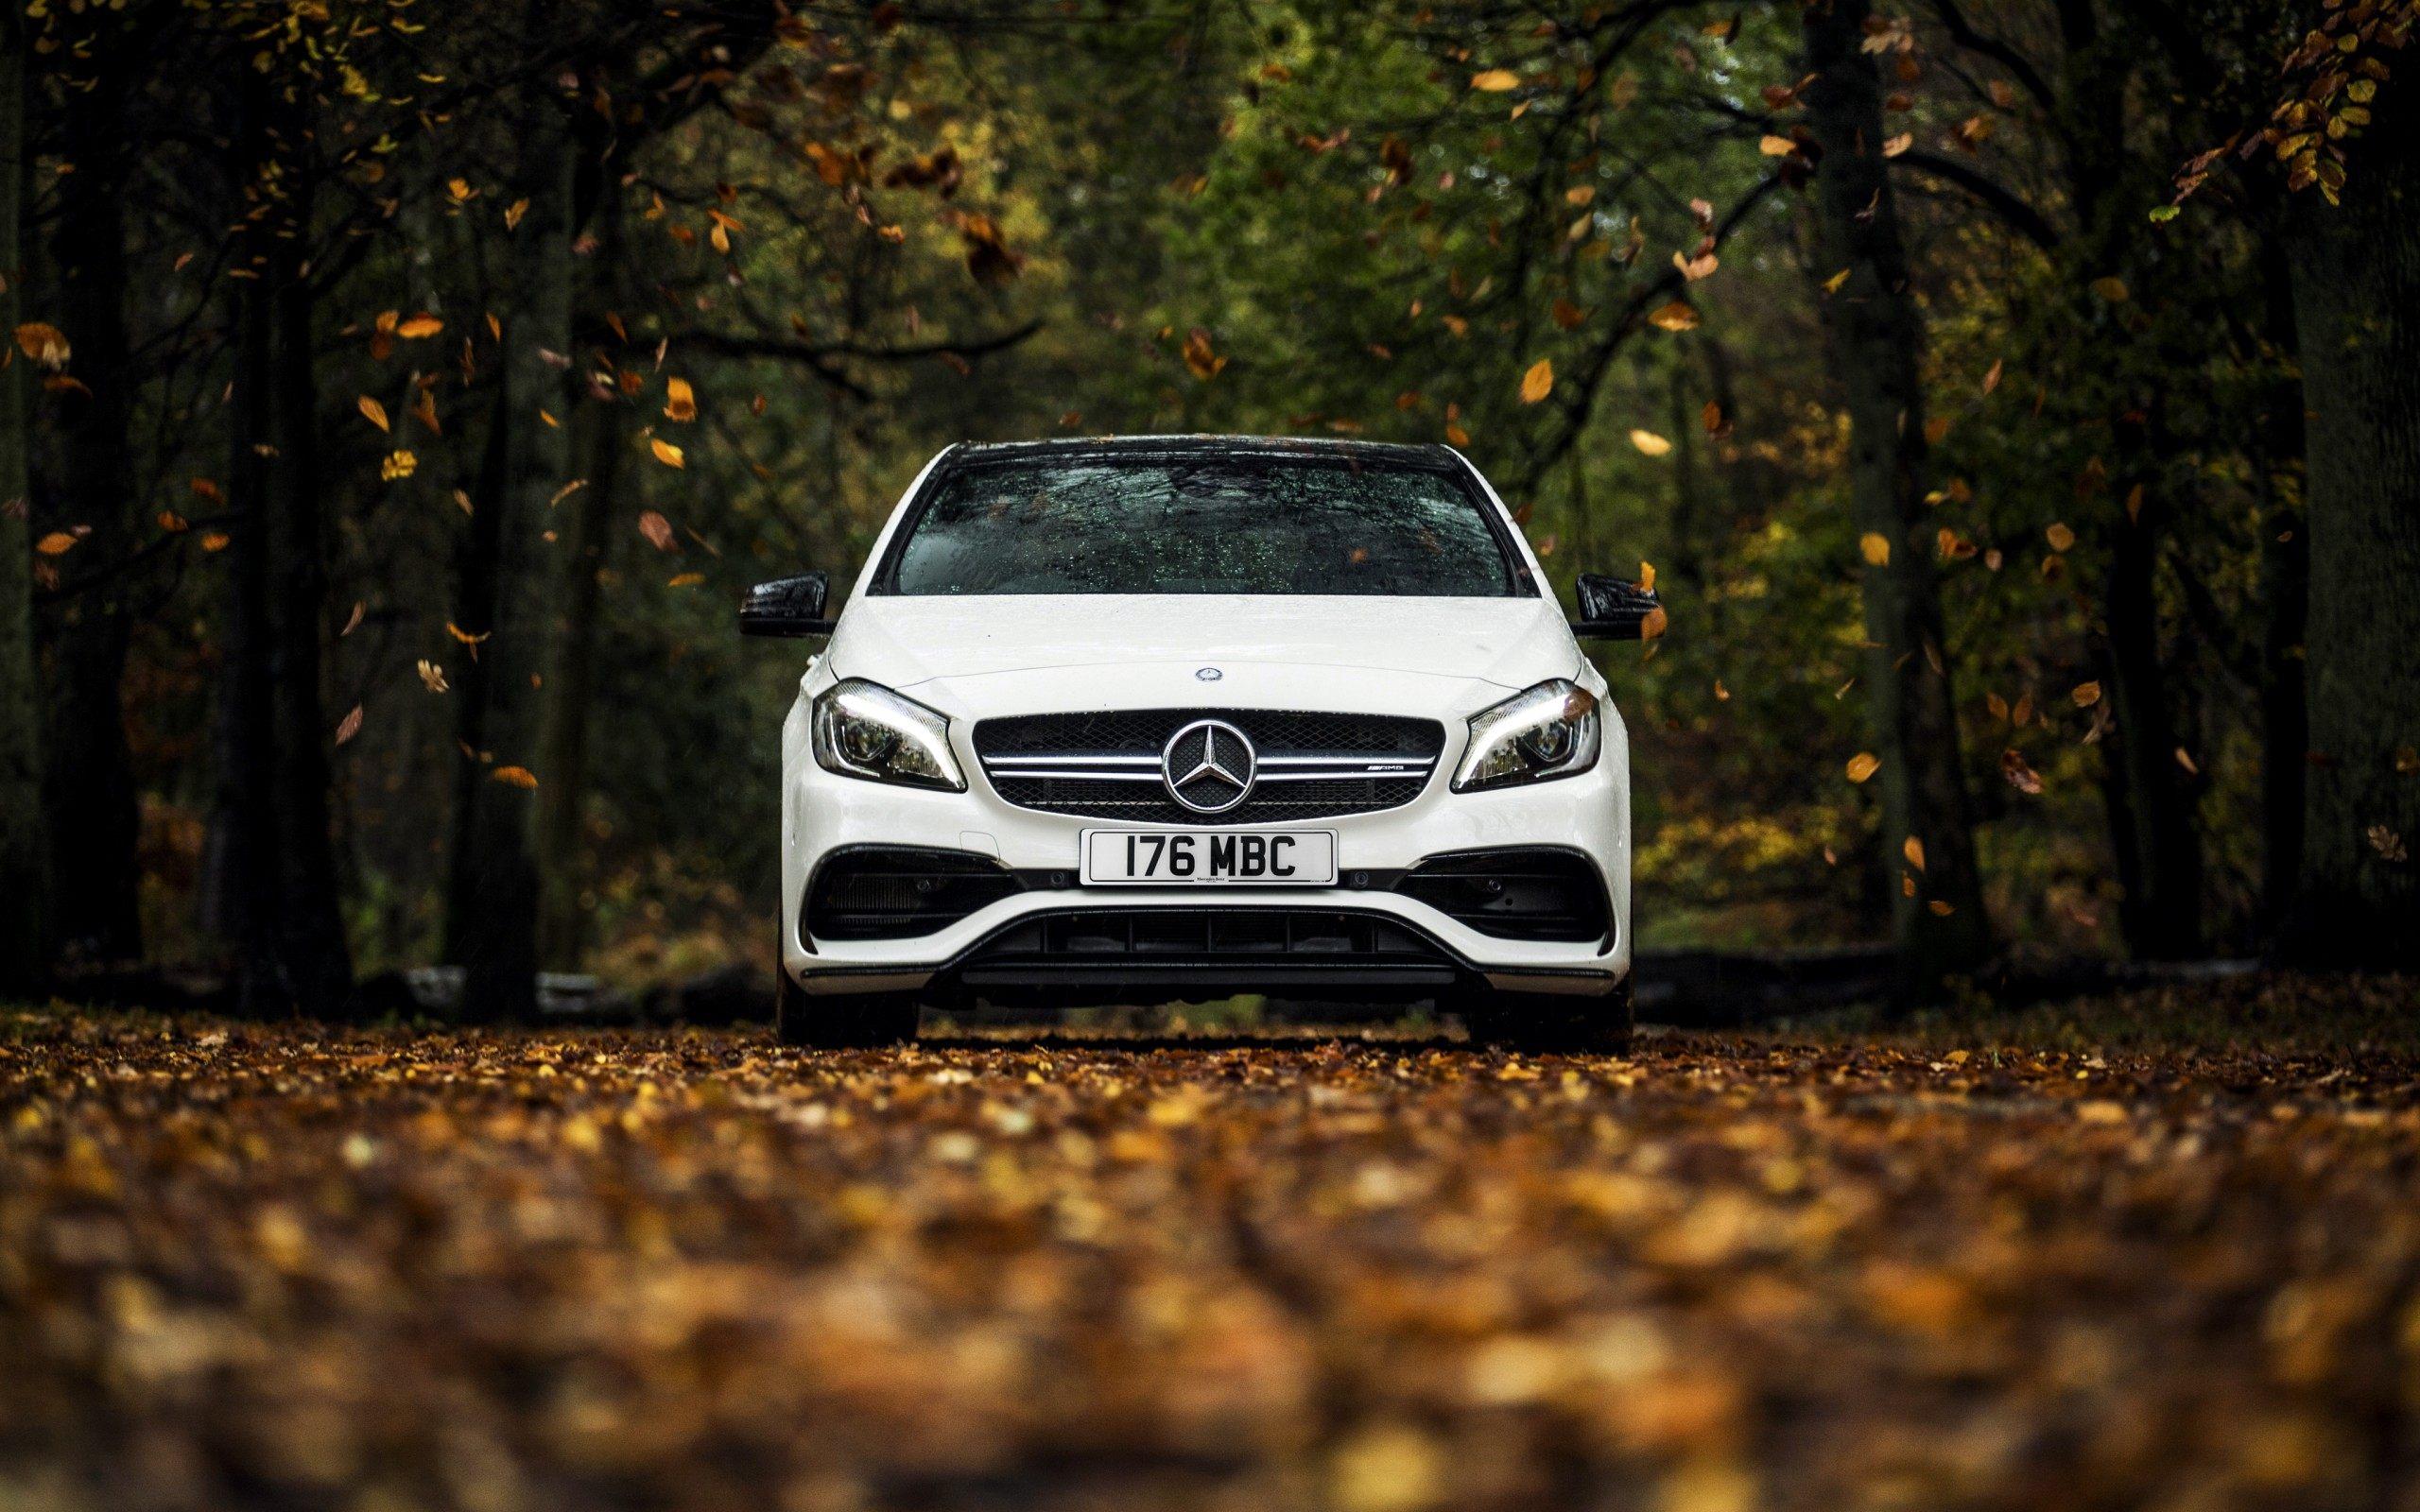 Mercedes W176 Autumn Car Wallpaper Download For Desktop 2560x1600